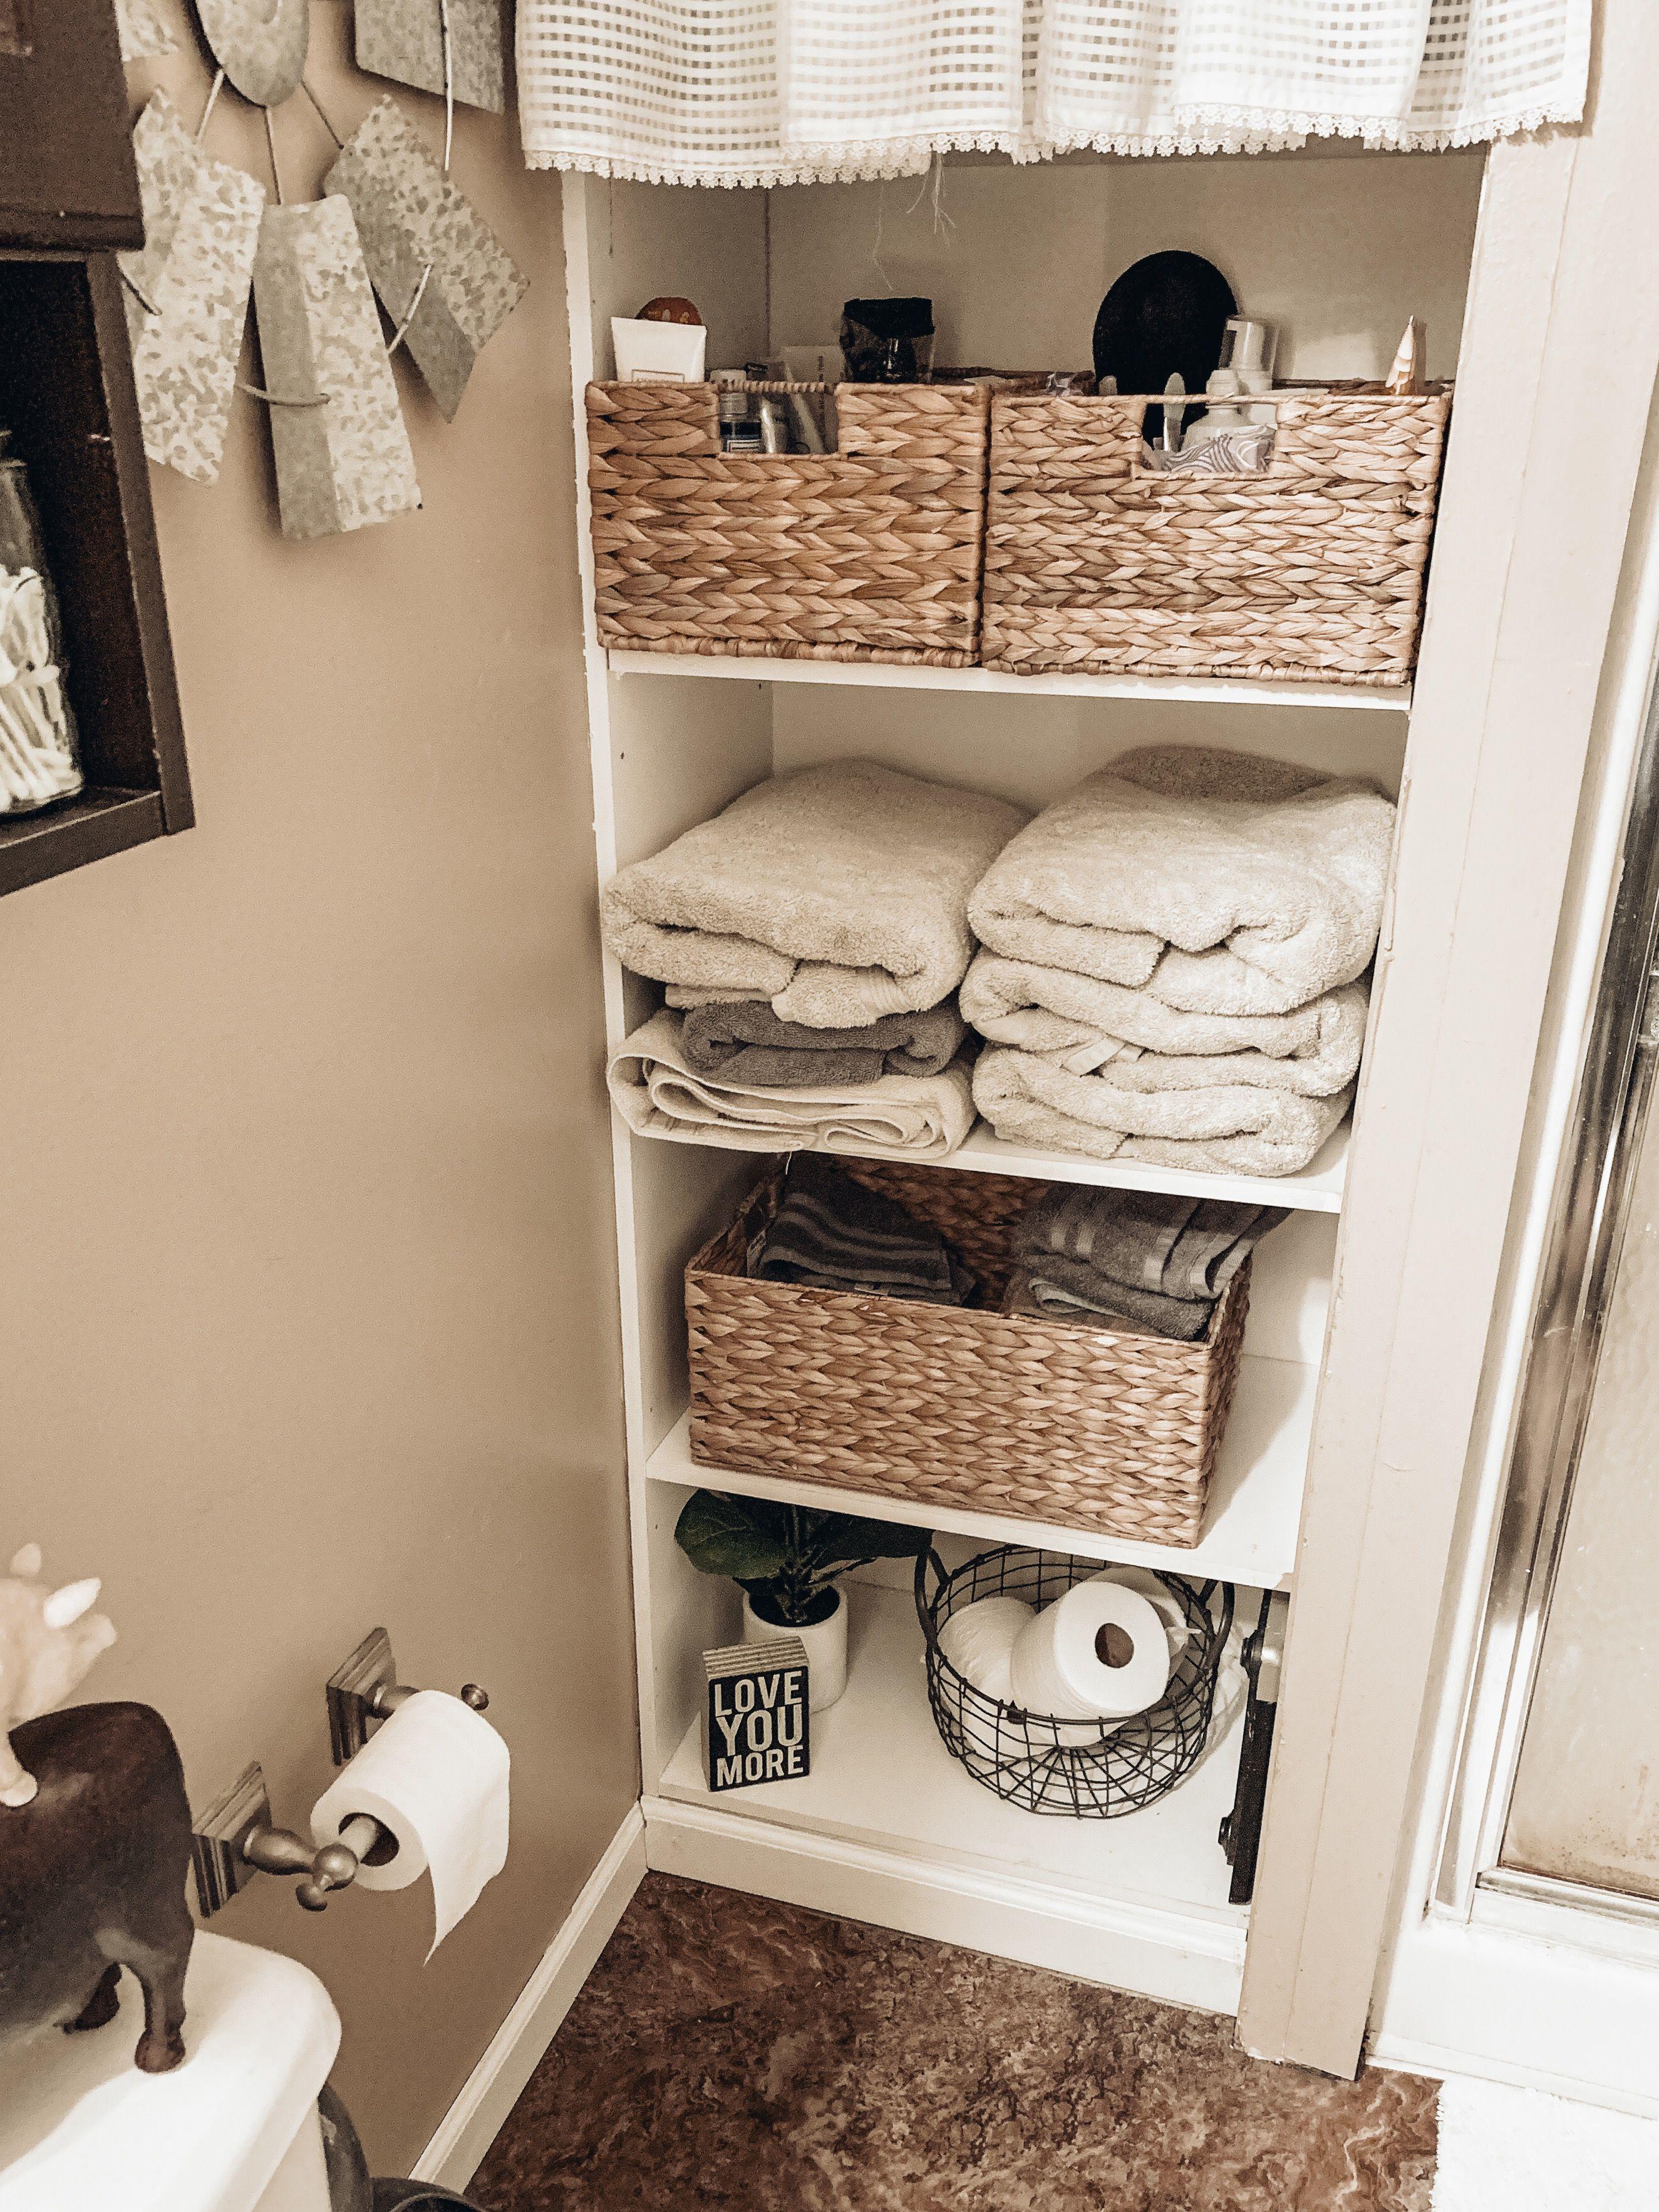 Bathroom Storage And Decor Follow Wockomehome On Instagram regarding measurements 2649 X 3533